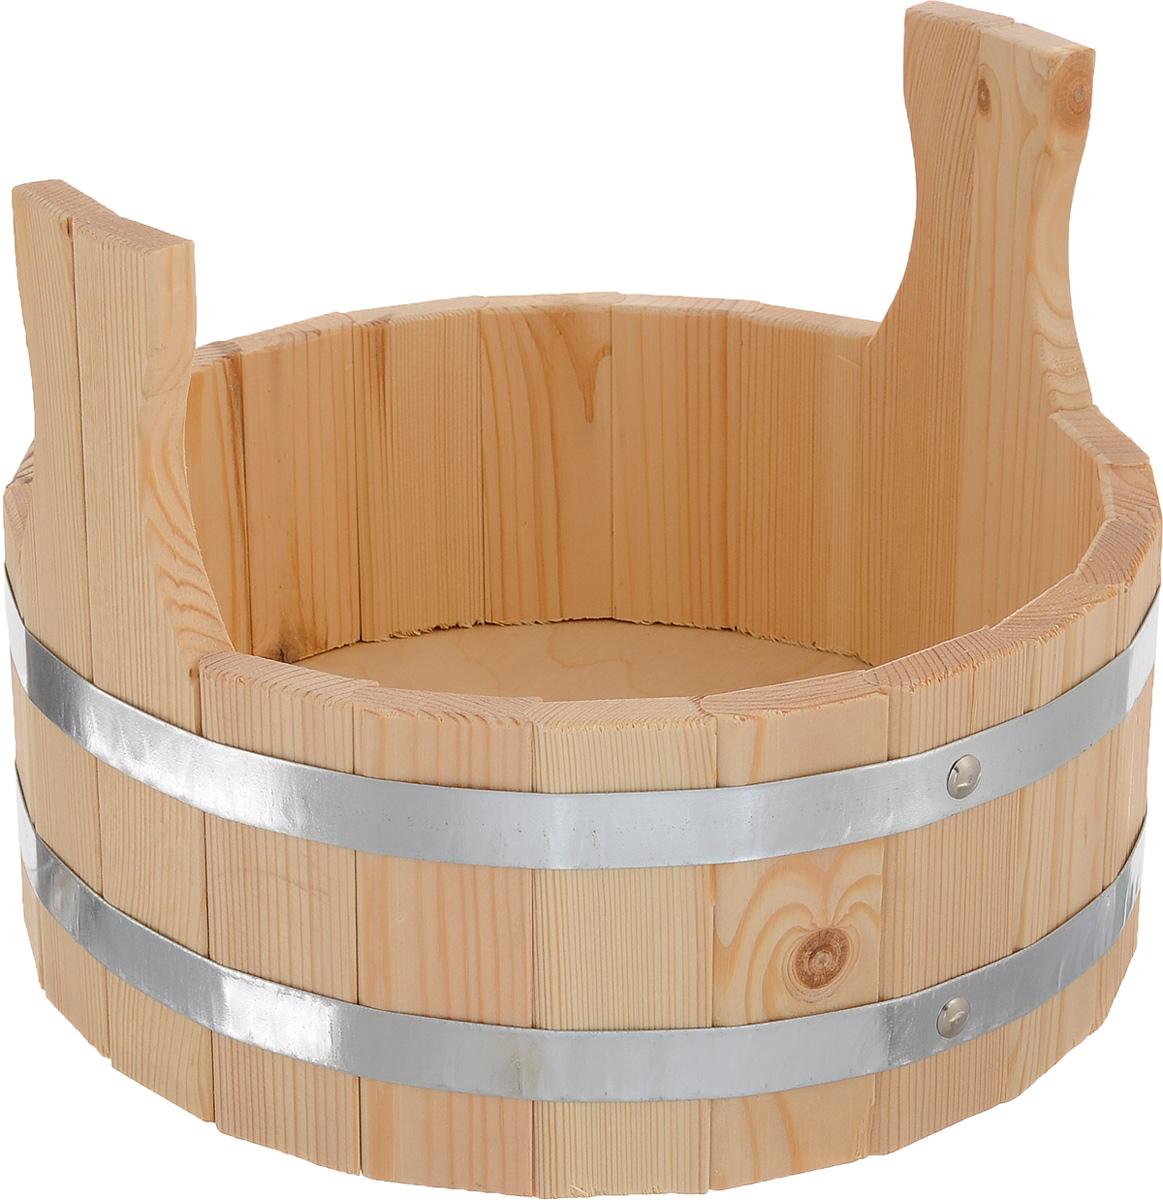 Шайка для бани и сауны Доктор баня, 5 л ковш доктор баня узор 3 л